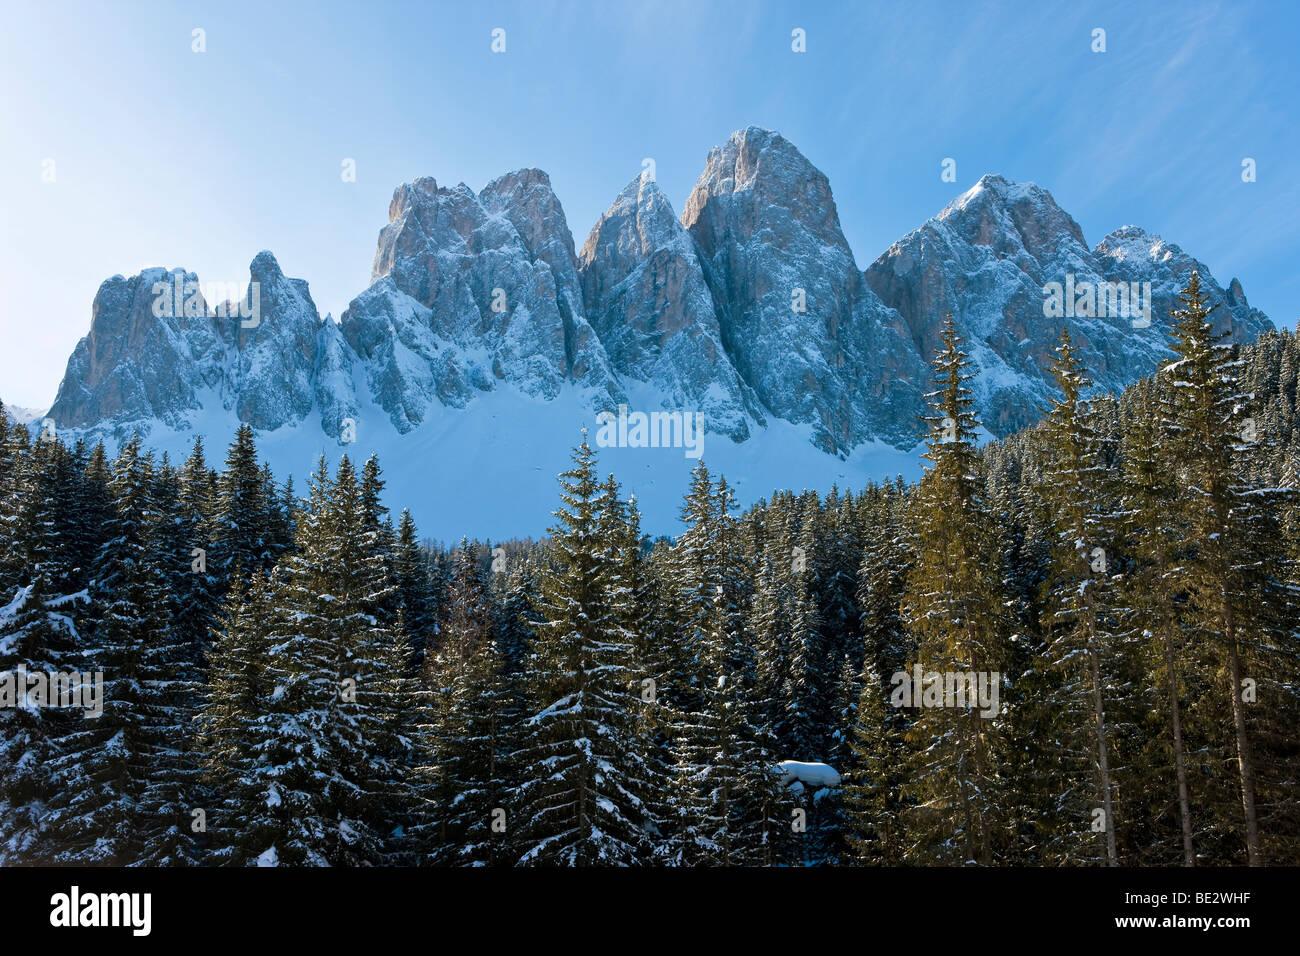 Winter-Landschaft, Le Geisler Gruppe/Geisler Rollen, Val di Funes, italienischen Dolomiten, Trentino-Alto Adige, Stockbild